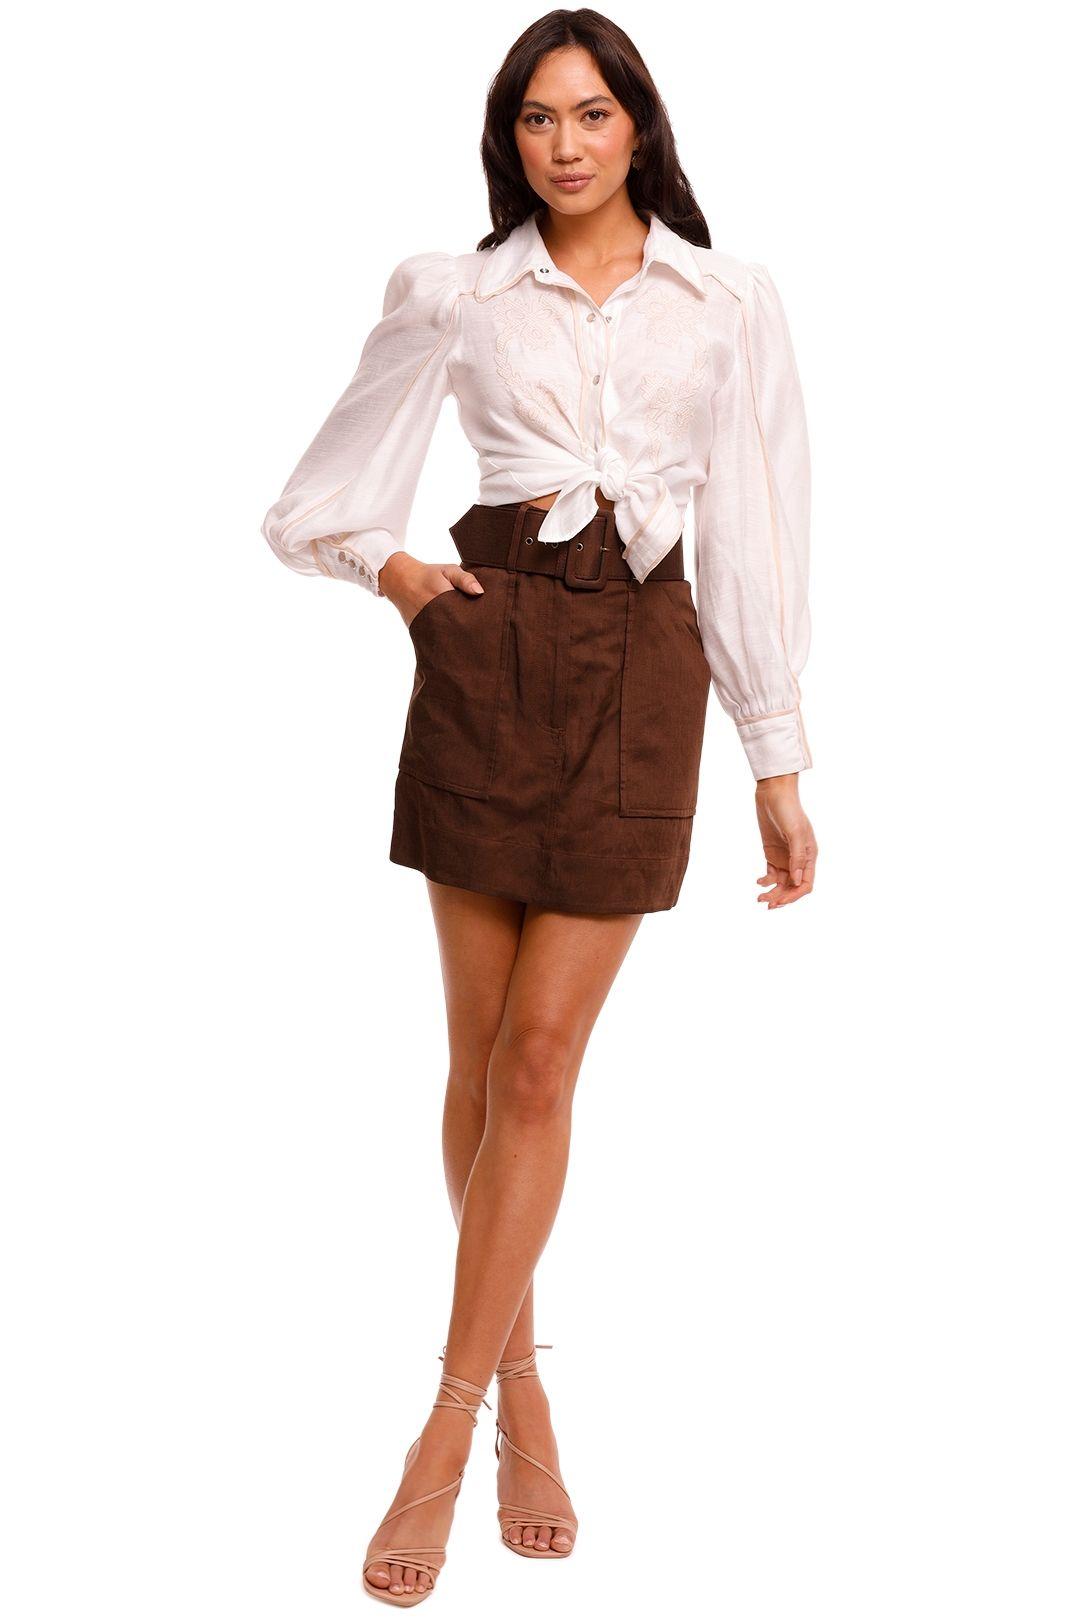 Shona Joy Mini Skirt Chocolate